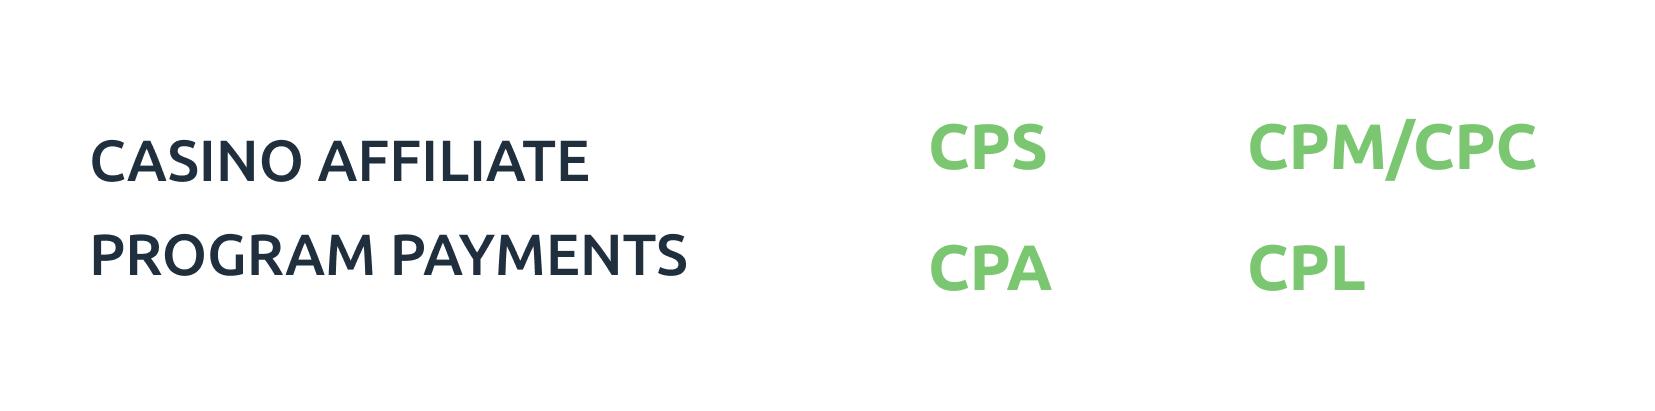 casino affiliate program payments